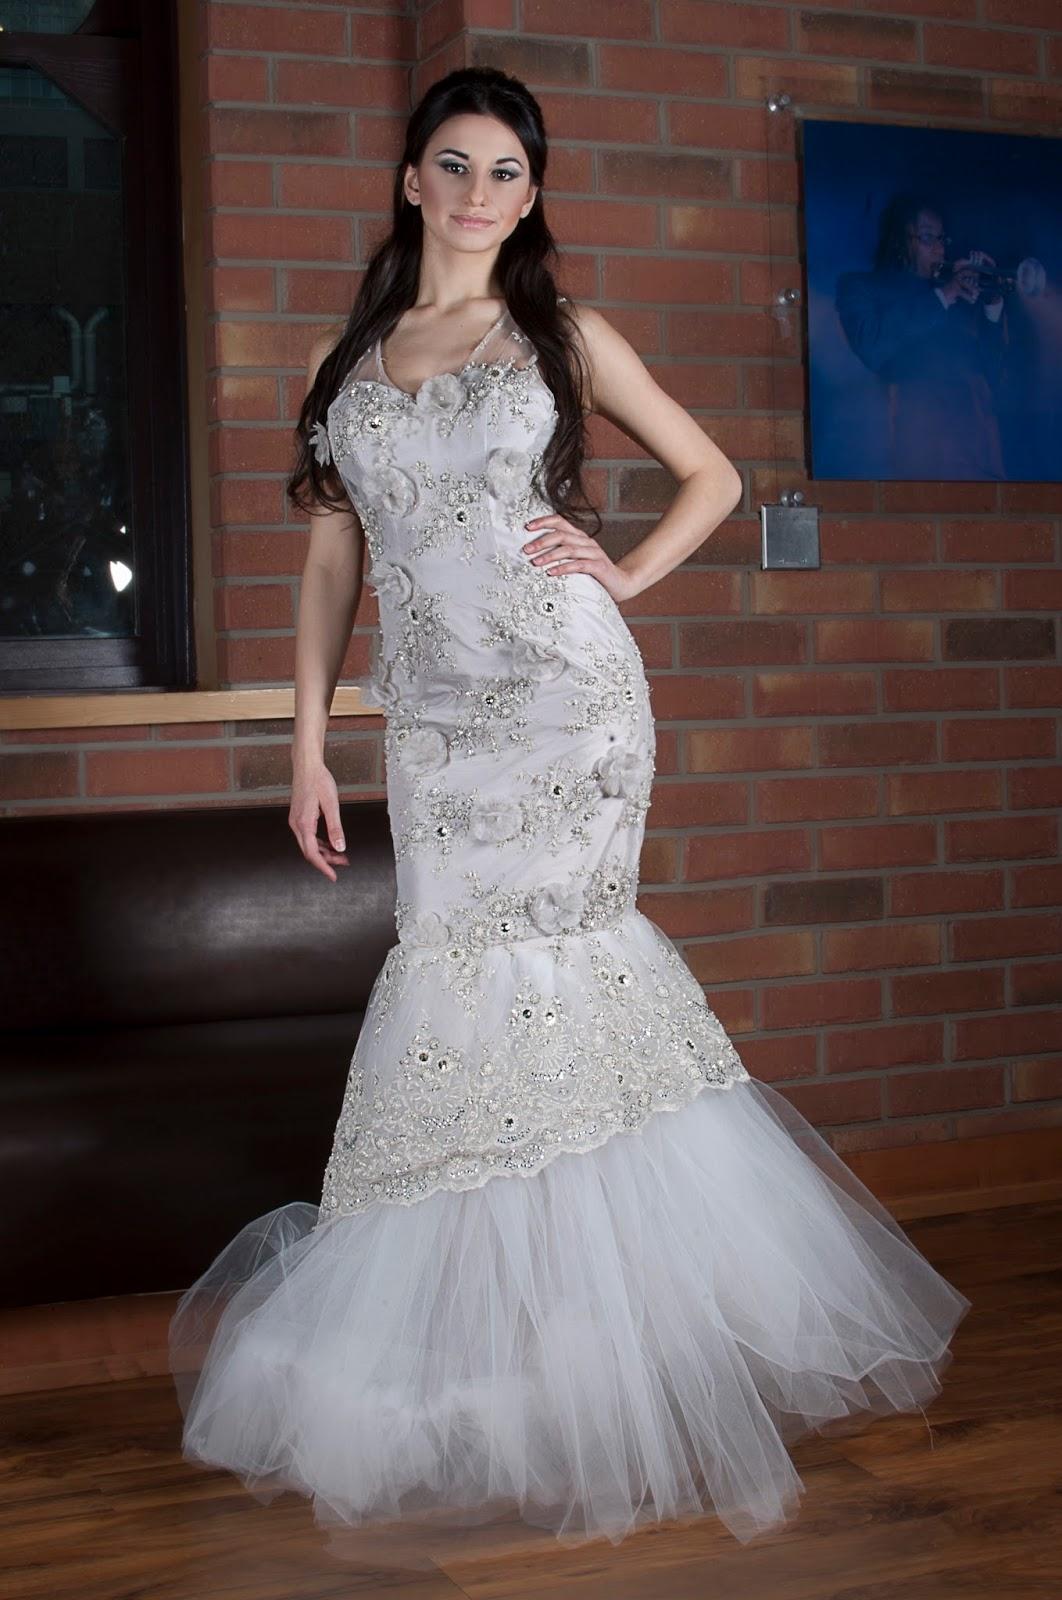 Wedding%2BDresses%2BUnder%2B1000%2BToronto%2B%25289%2529 - Wedding Dresses Toronto